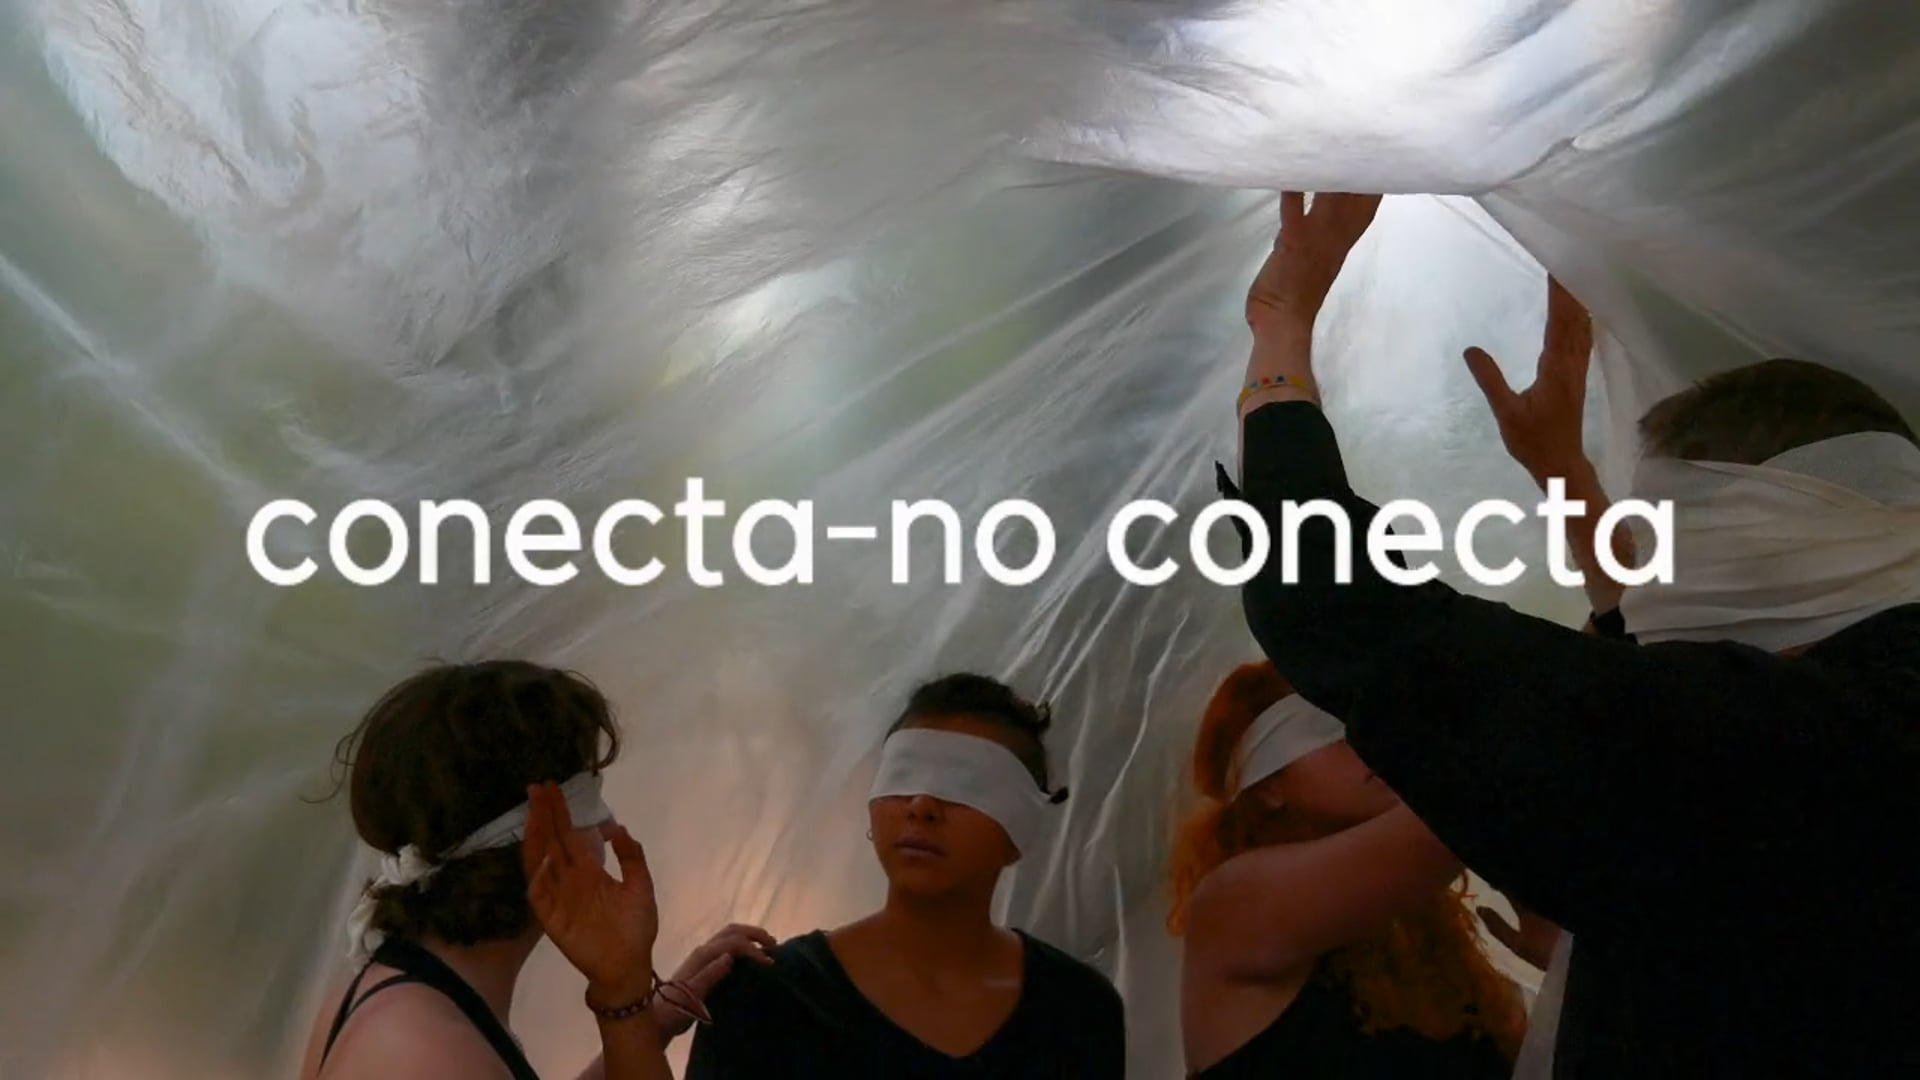 Conecta, no conecta   Video-performance